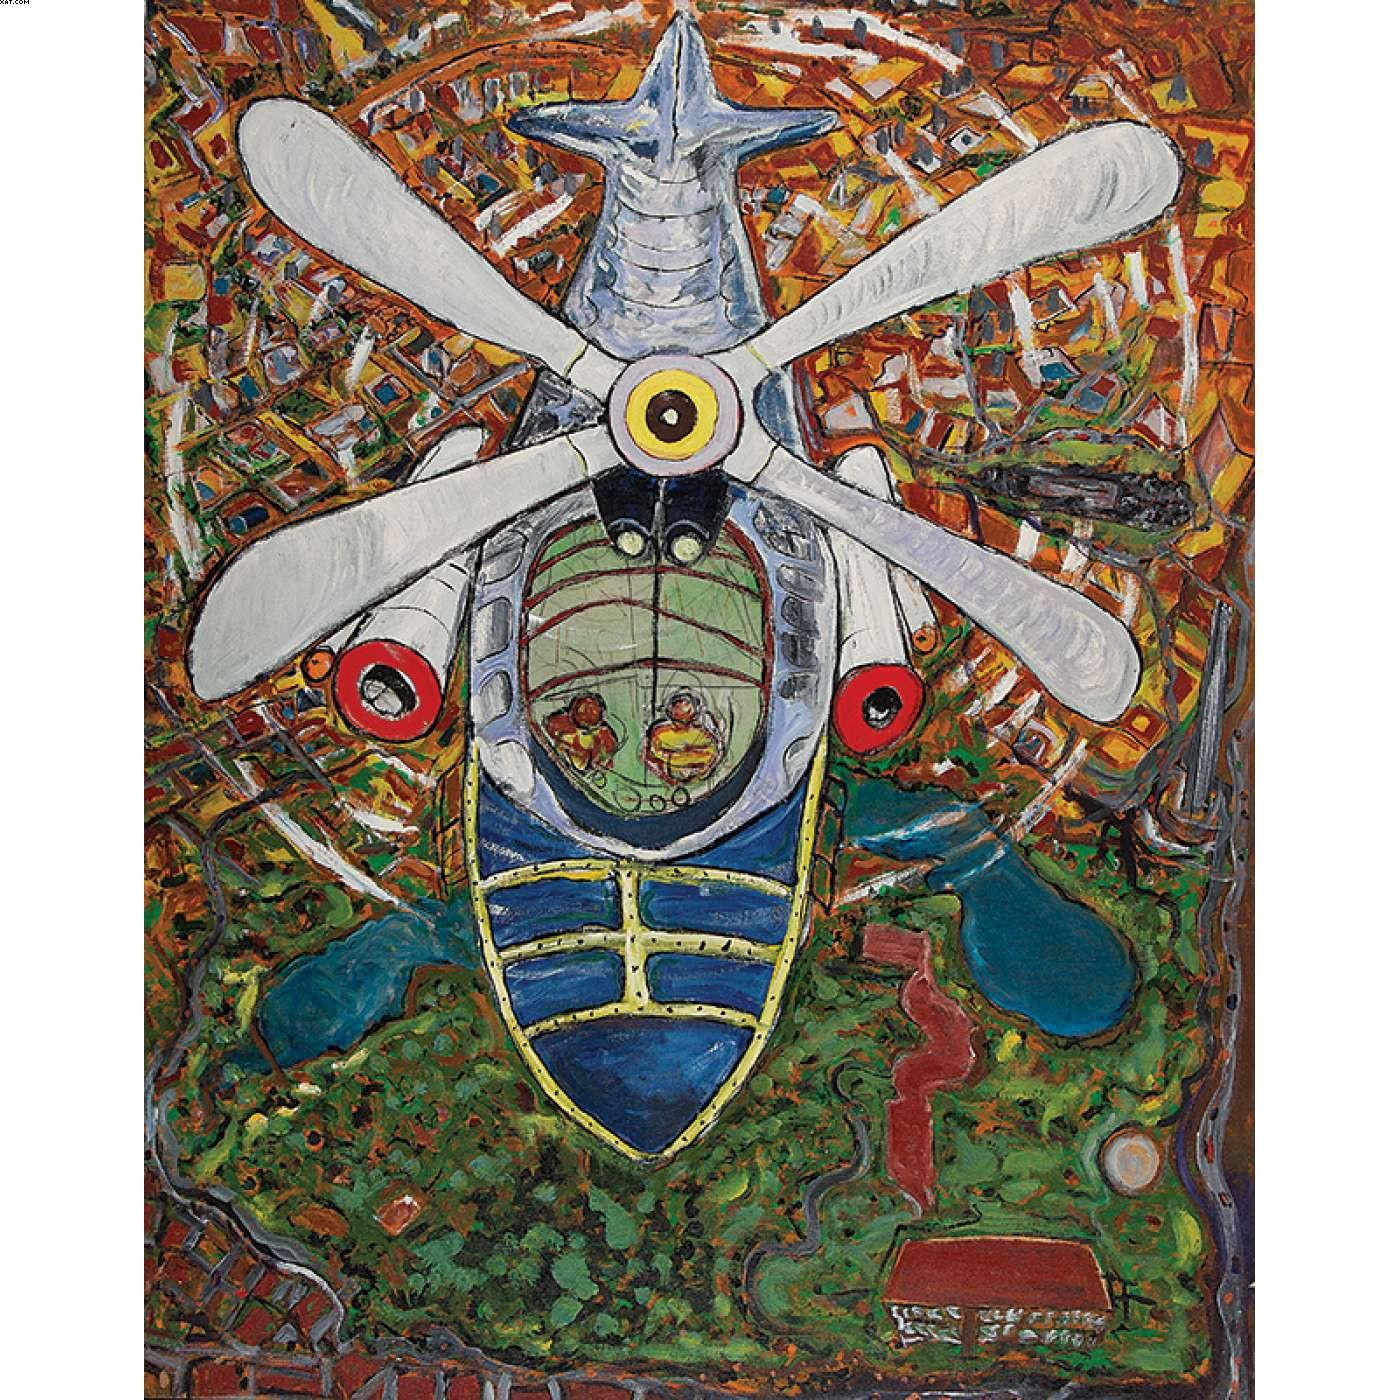 Helicóptero - Luiz Hermano - Luiz Hermano Façanha Farias